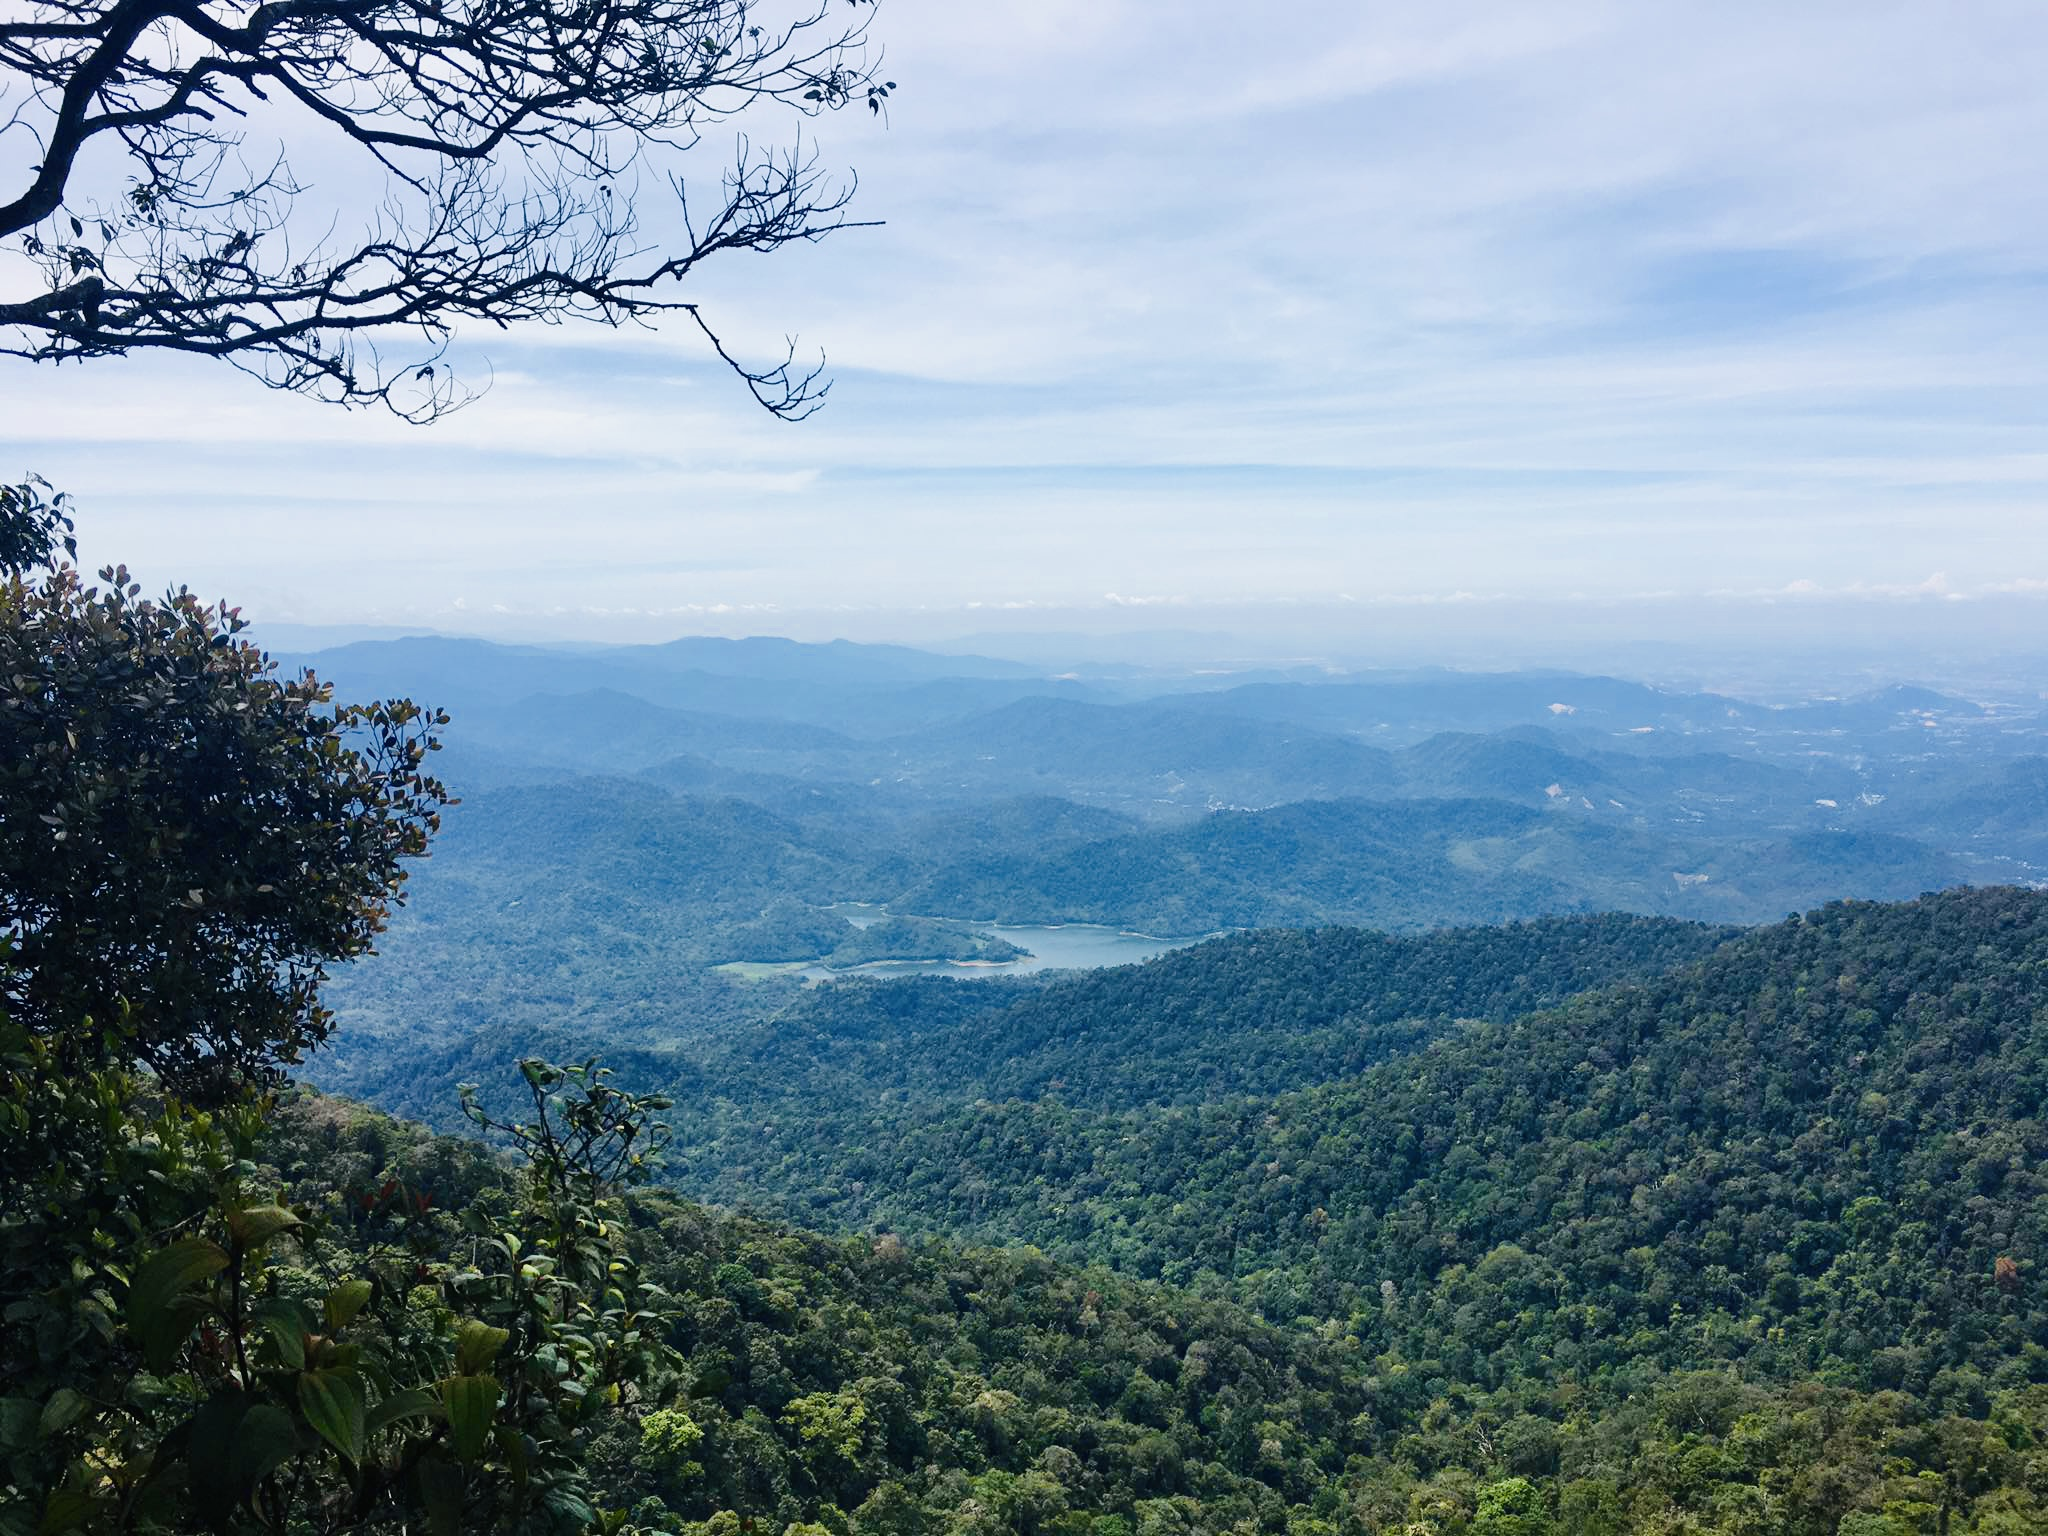 Catchingtravels: Gunung Nuang via Pangsoon (Hulu Langat) – Popular Training  Ground For Upcoming Big Hikes